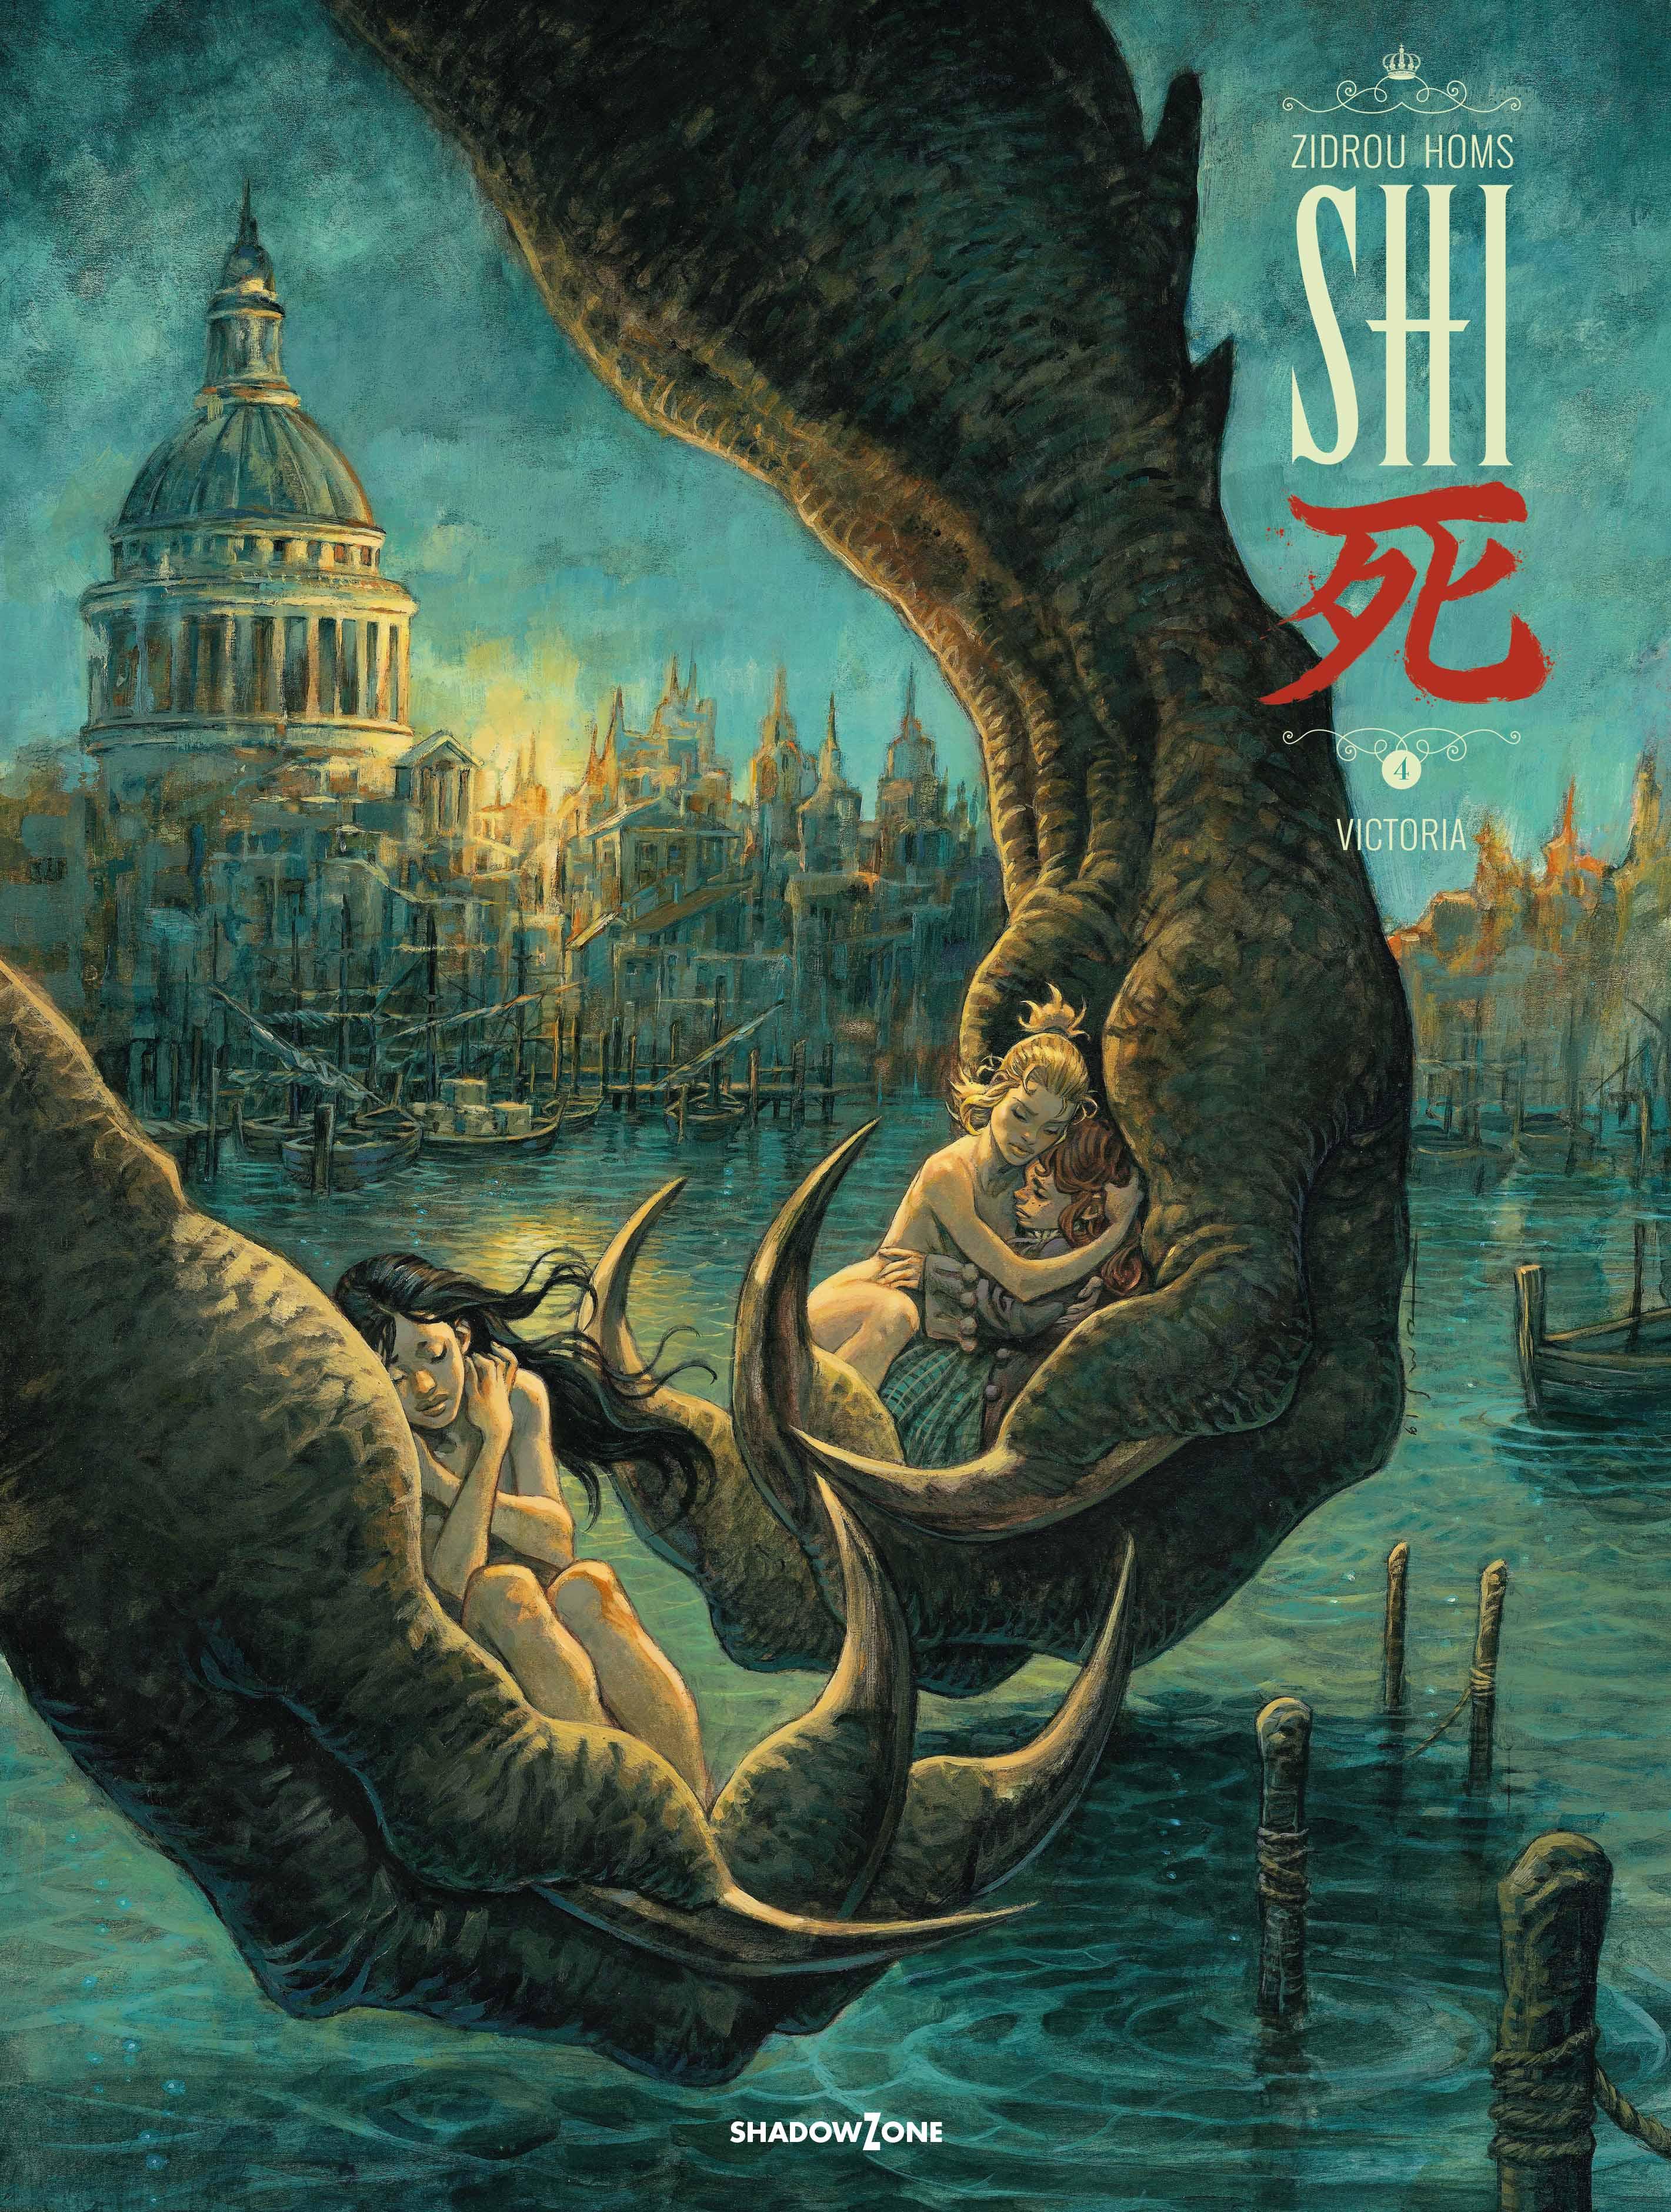 SHI: SHI 4 - Victoria - Zidrou og José Homs - Bøger - Shadow Zone Media - 9788792048417 - 29/5-2020